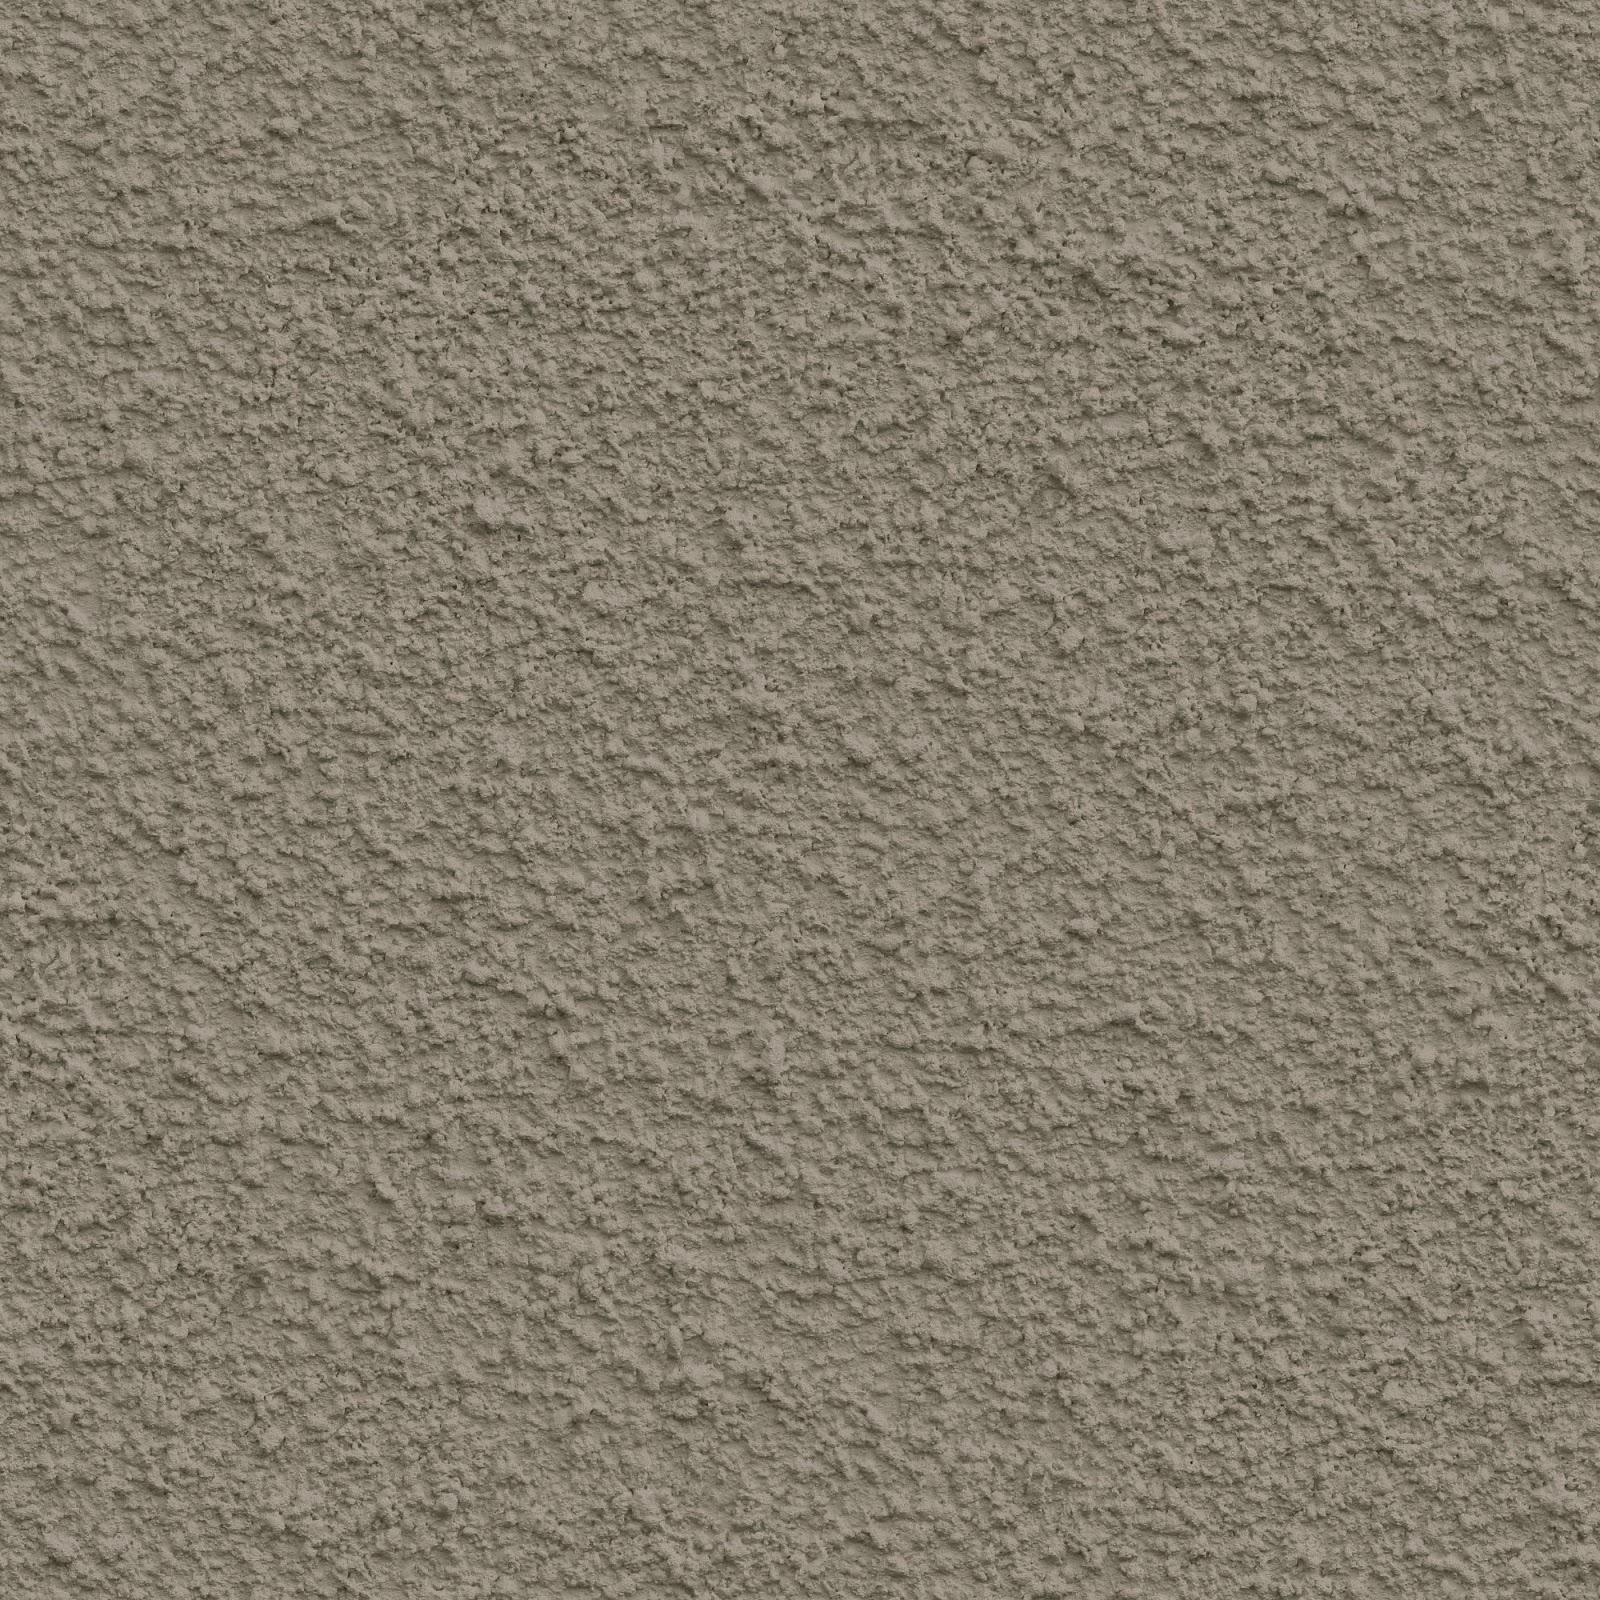 High Resolution Seamless Textures: Stucco